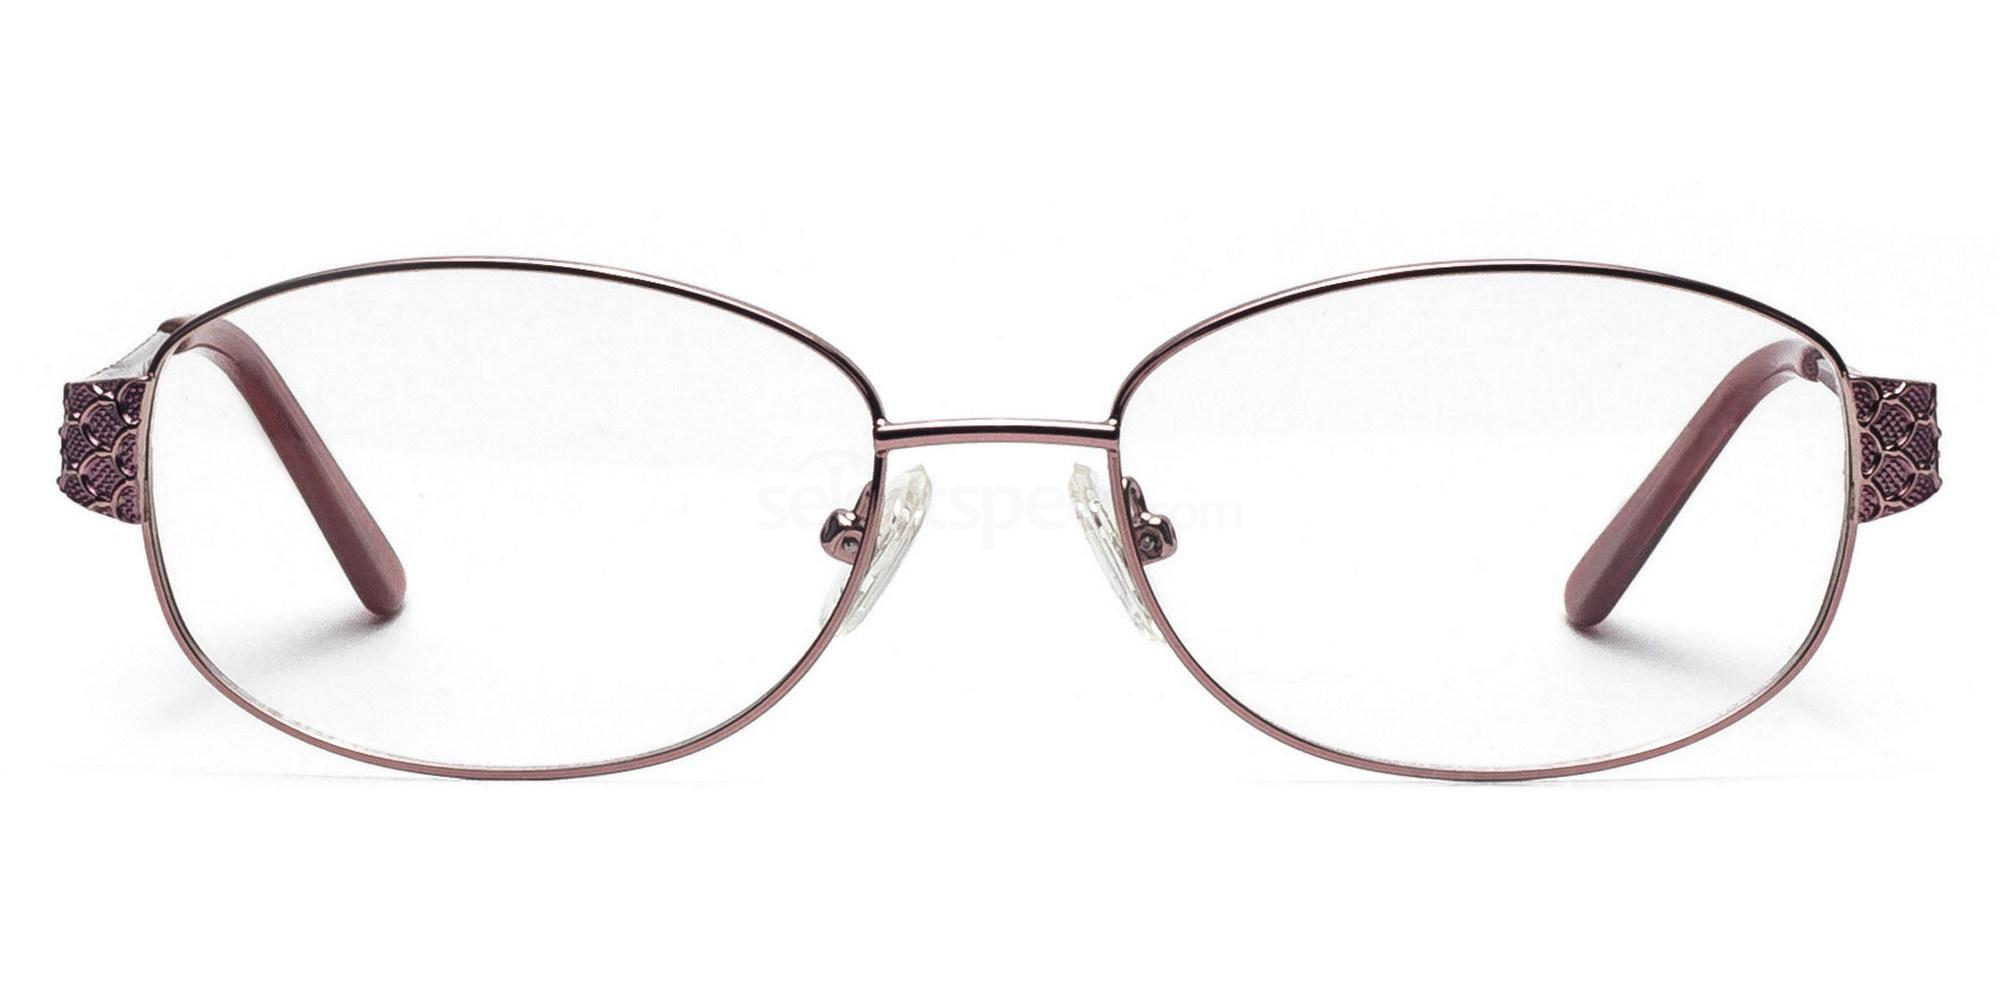 C1 SRM004 Glasses, Infinity